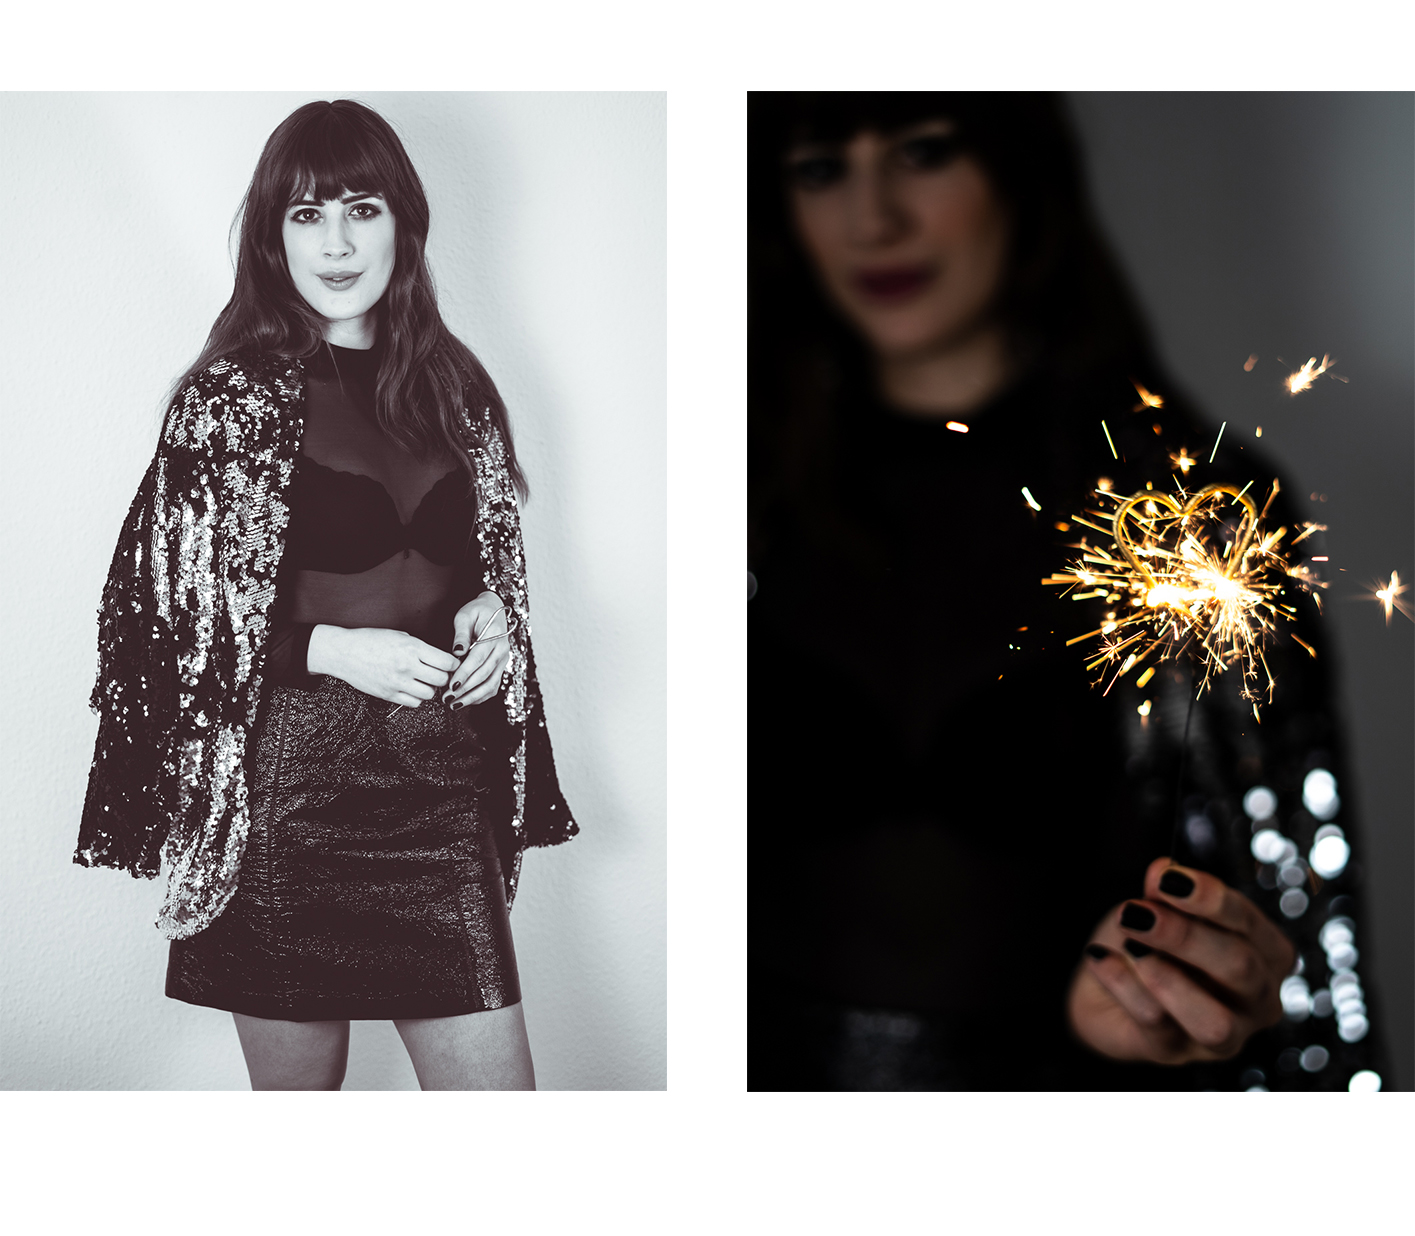 Silvester Outfit mit Lingerie kombinieren-Inspiration Silvester Outfit-Body mit Transparenz-Marie Jo Dessous-Lifestyleblog-Modeblog Berlin-andysparkles